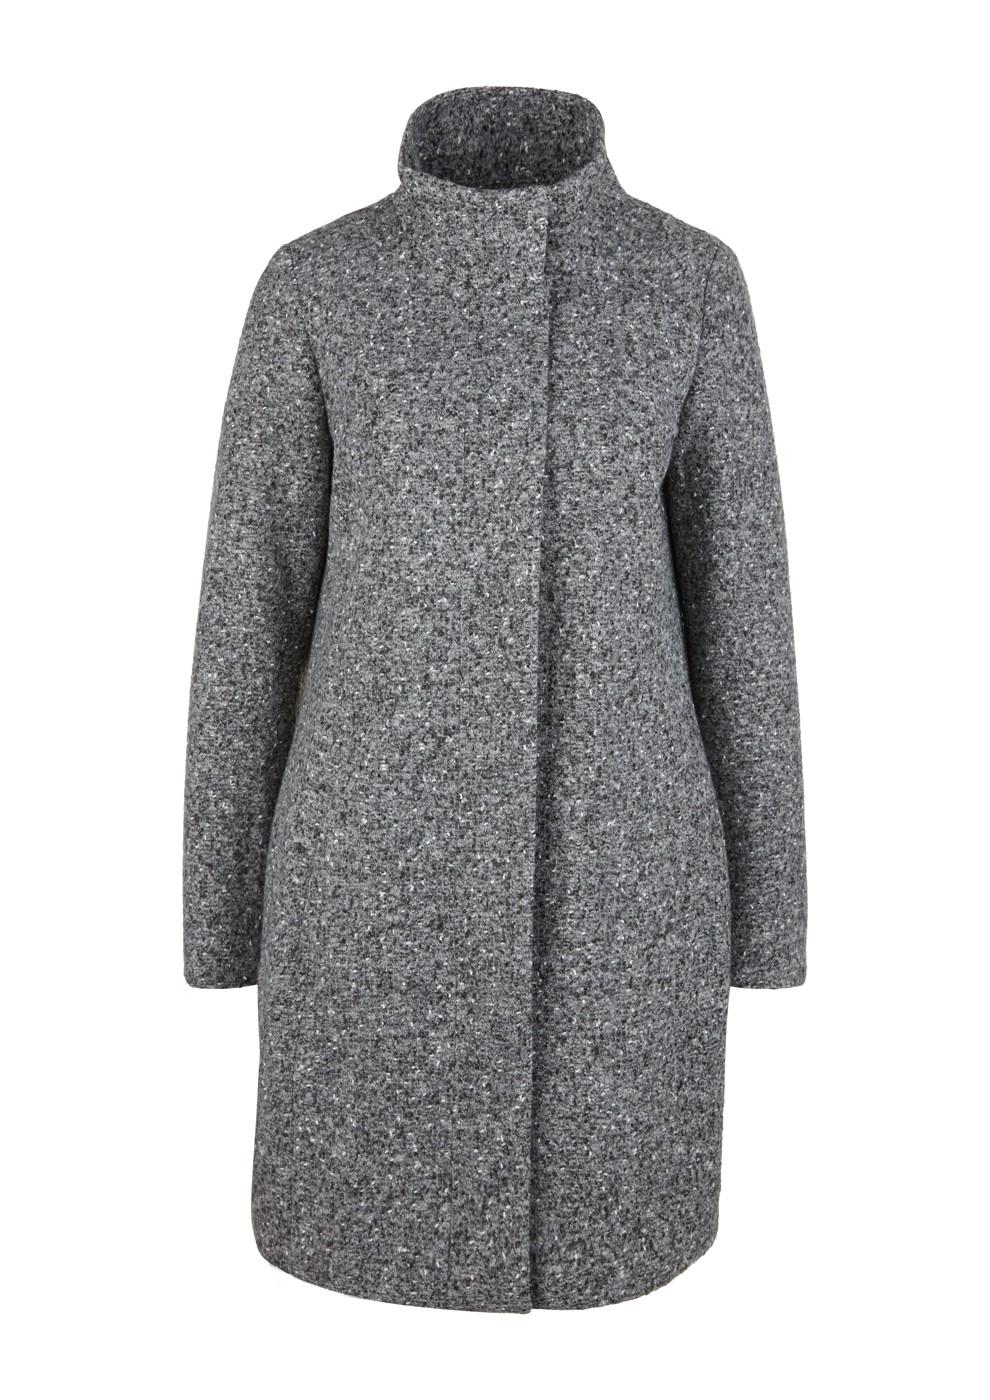 120 Mantel langarm - Damen